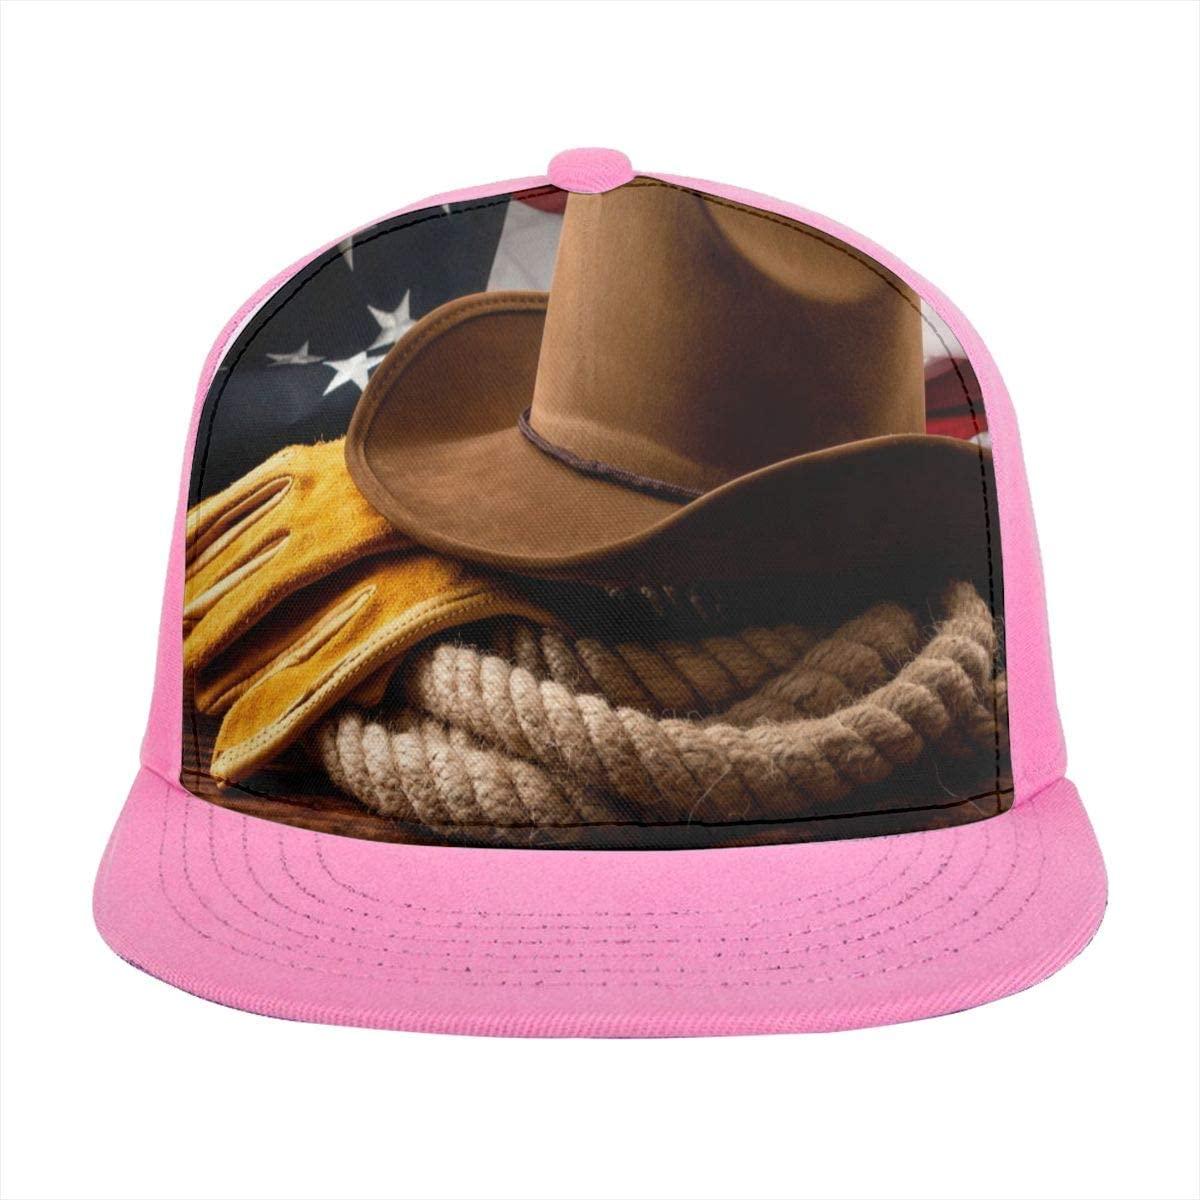 SLHFPX Sun Visor Hat American Culture Baseball Cap Flat Brim Hat for Women Men Summer